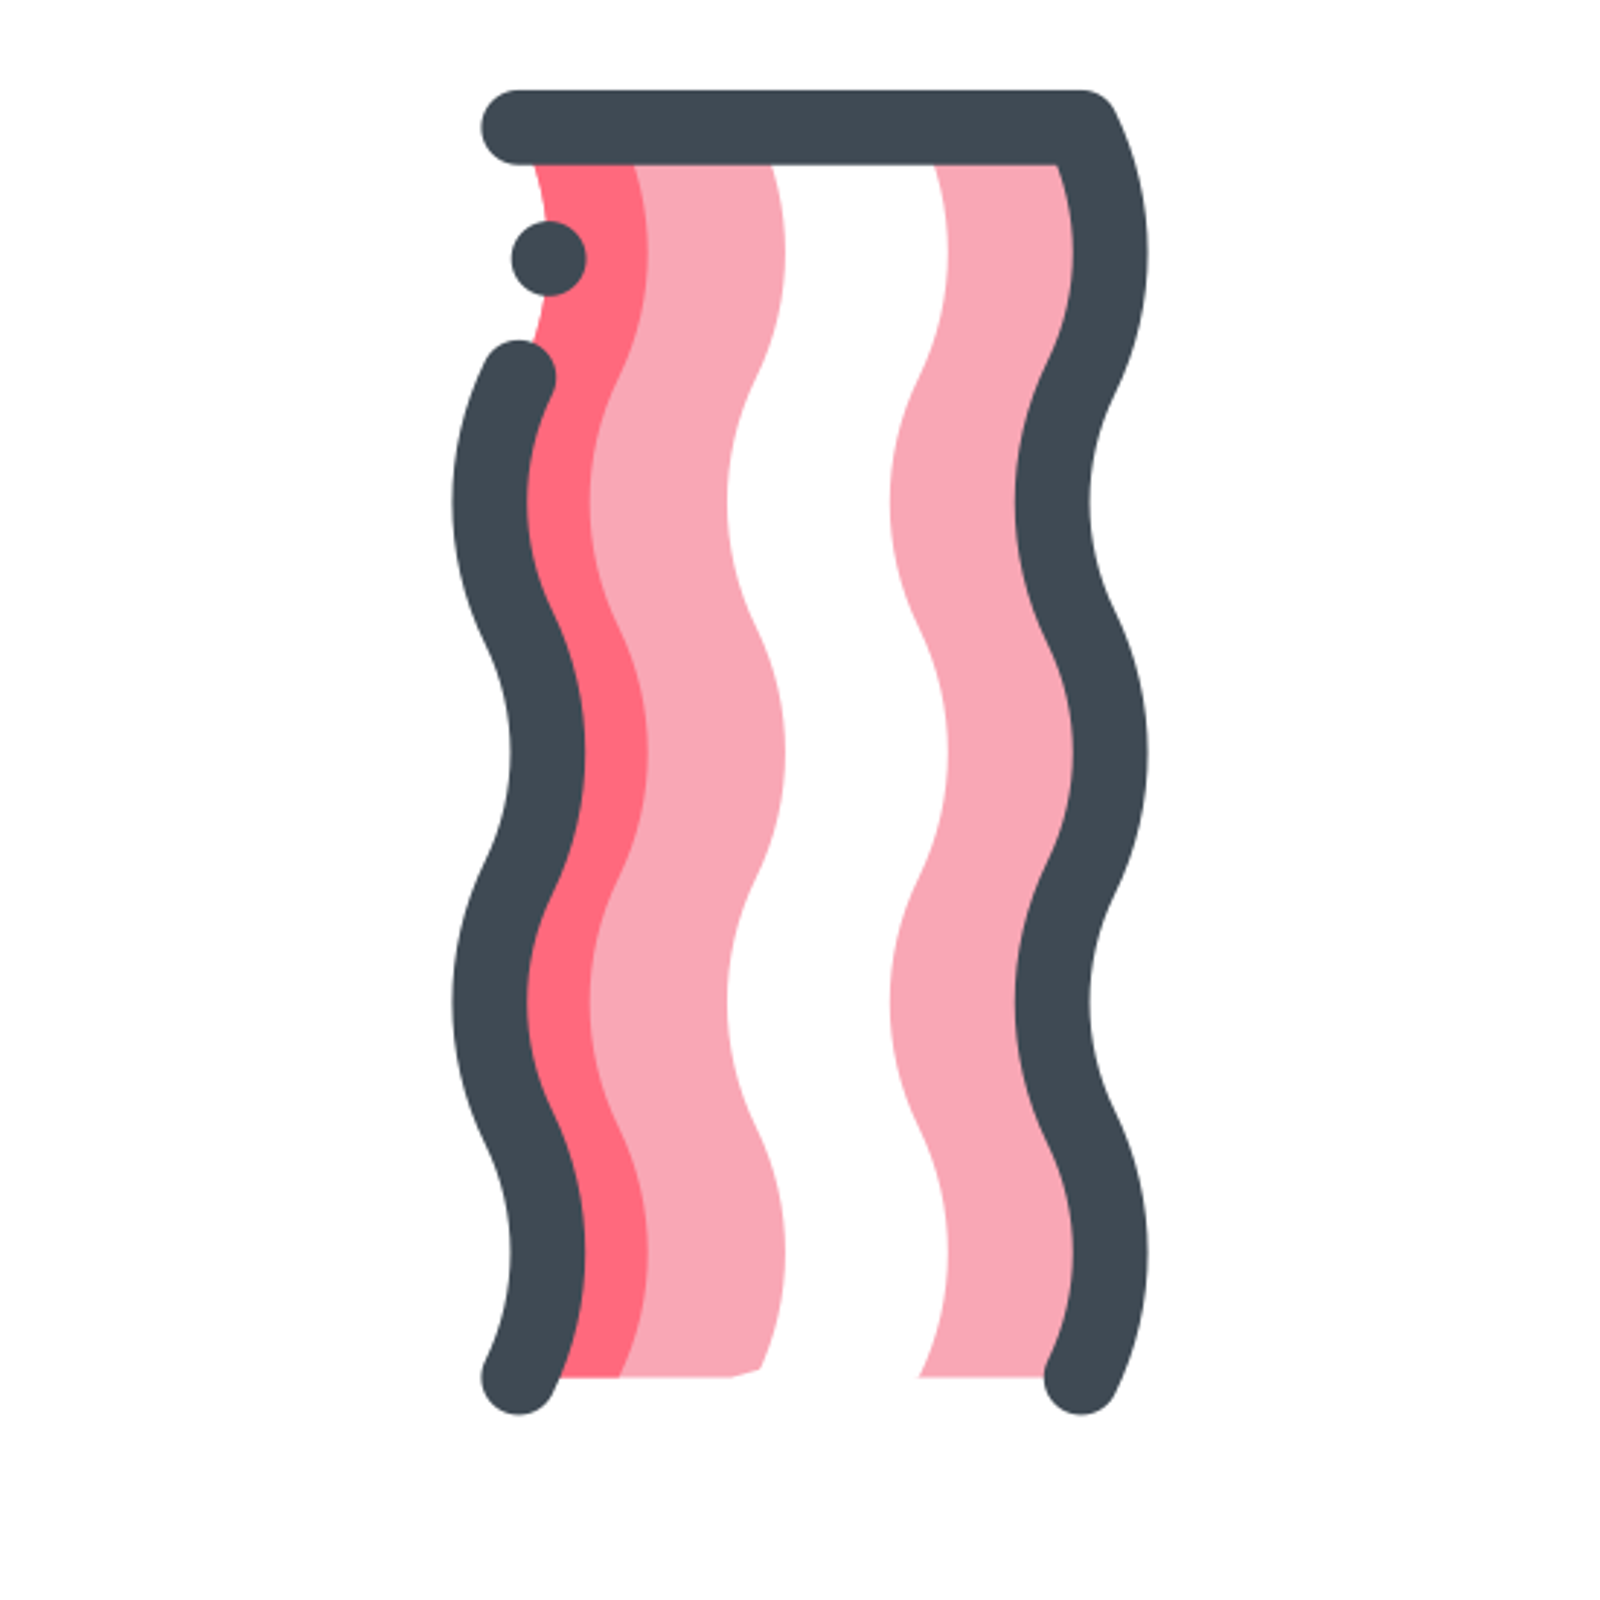 Boczek icon